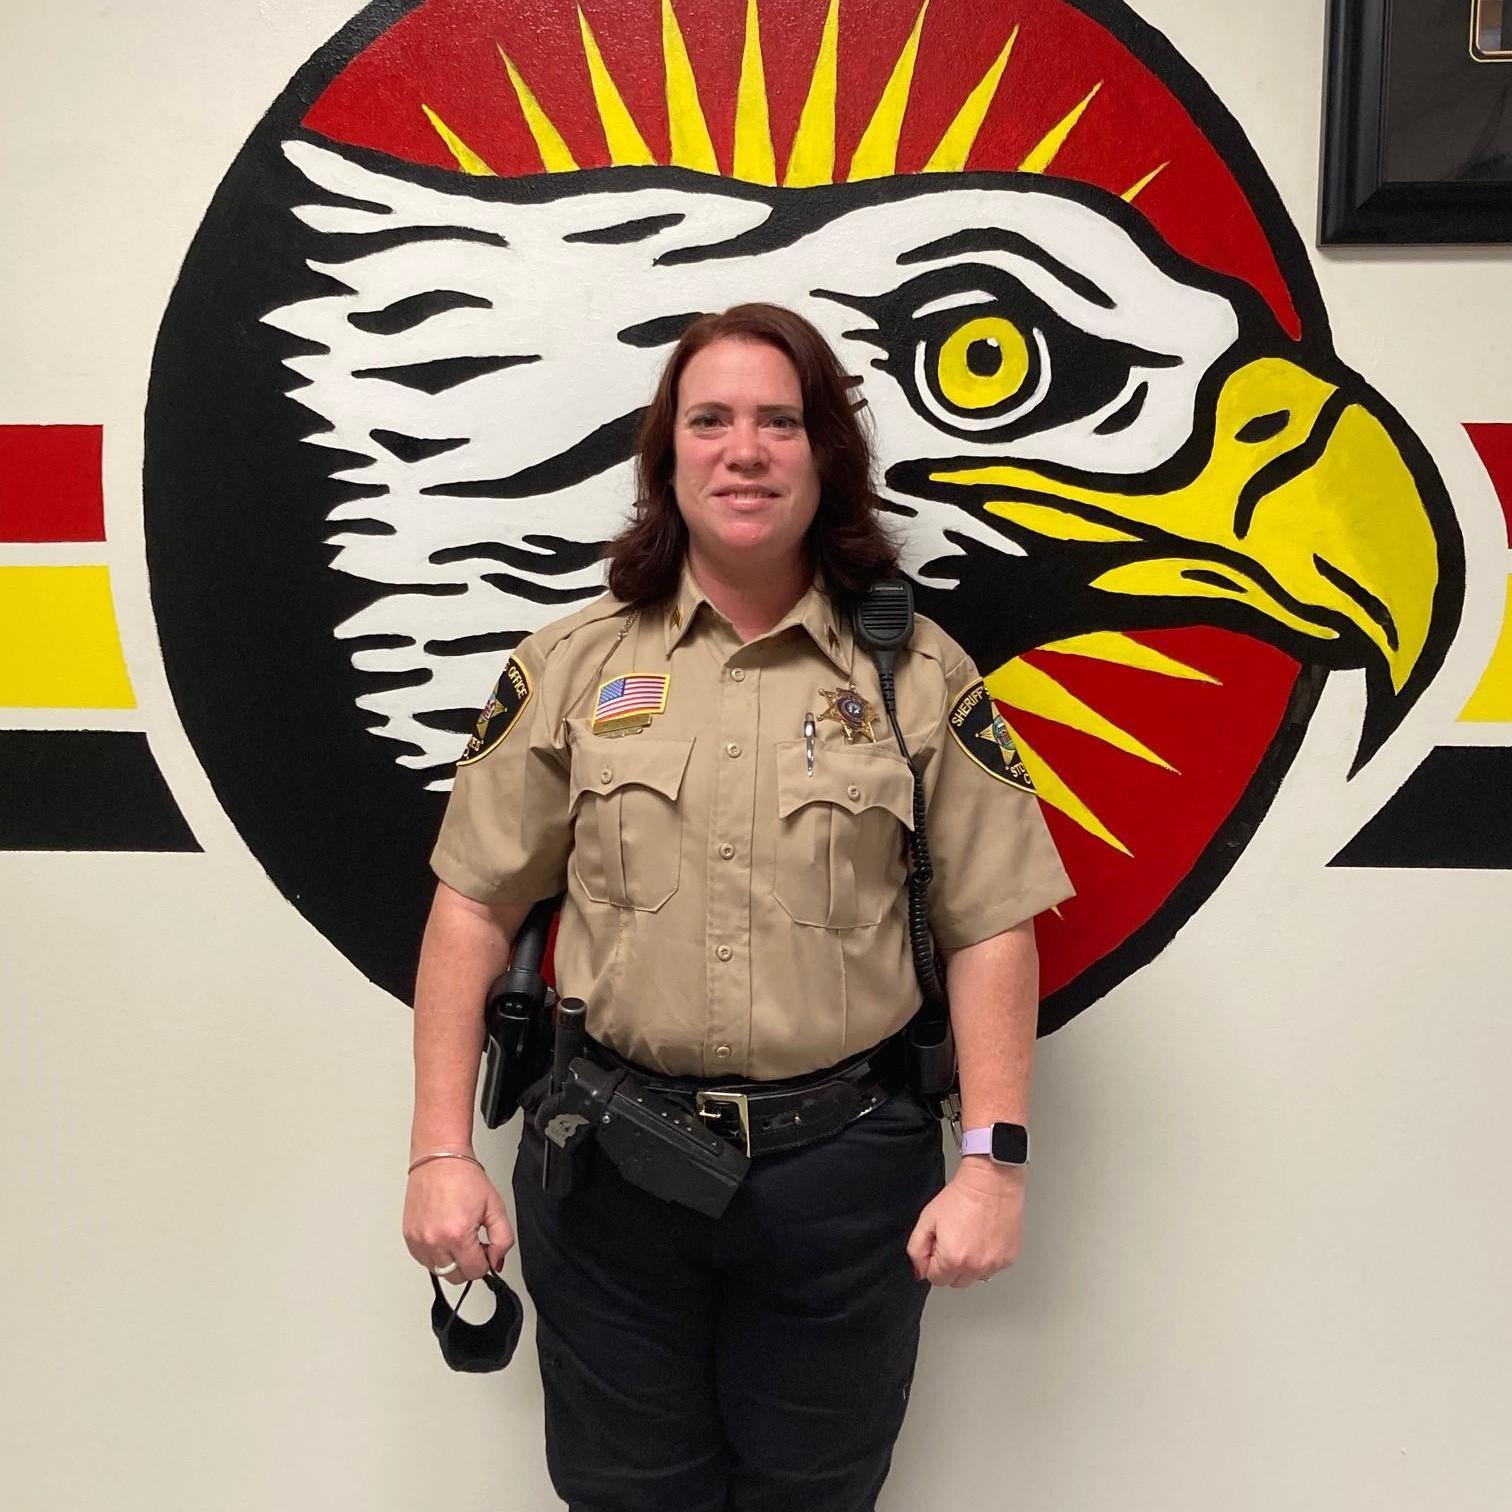 Sgt. Mary Ziglar's Profile Photo